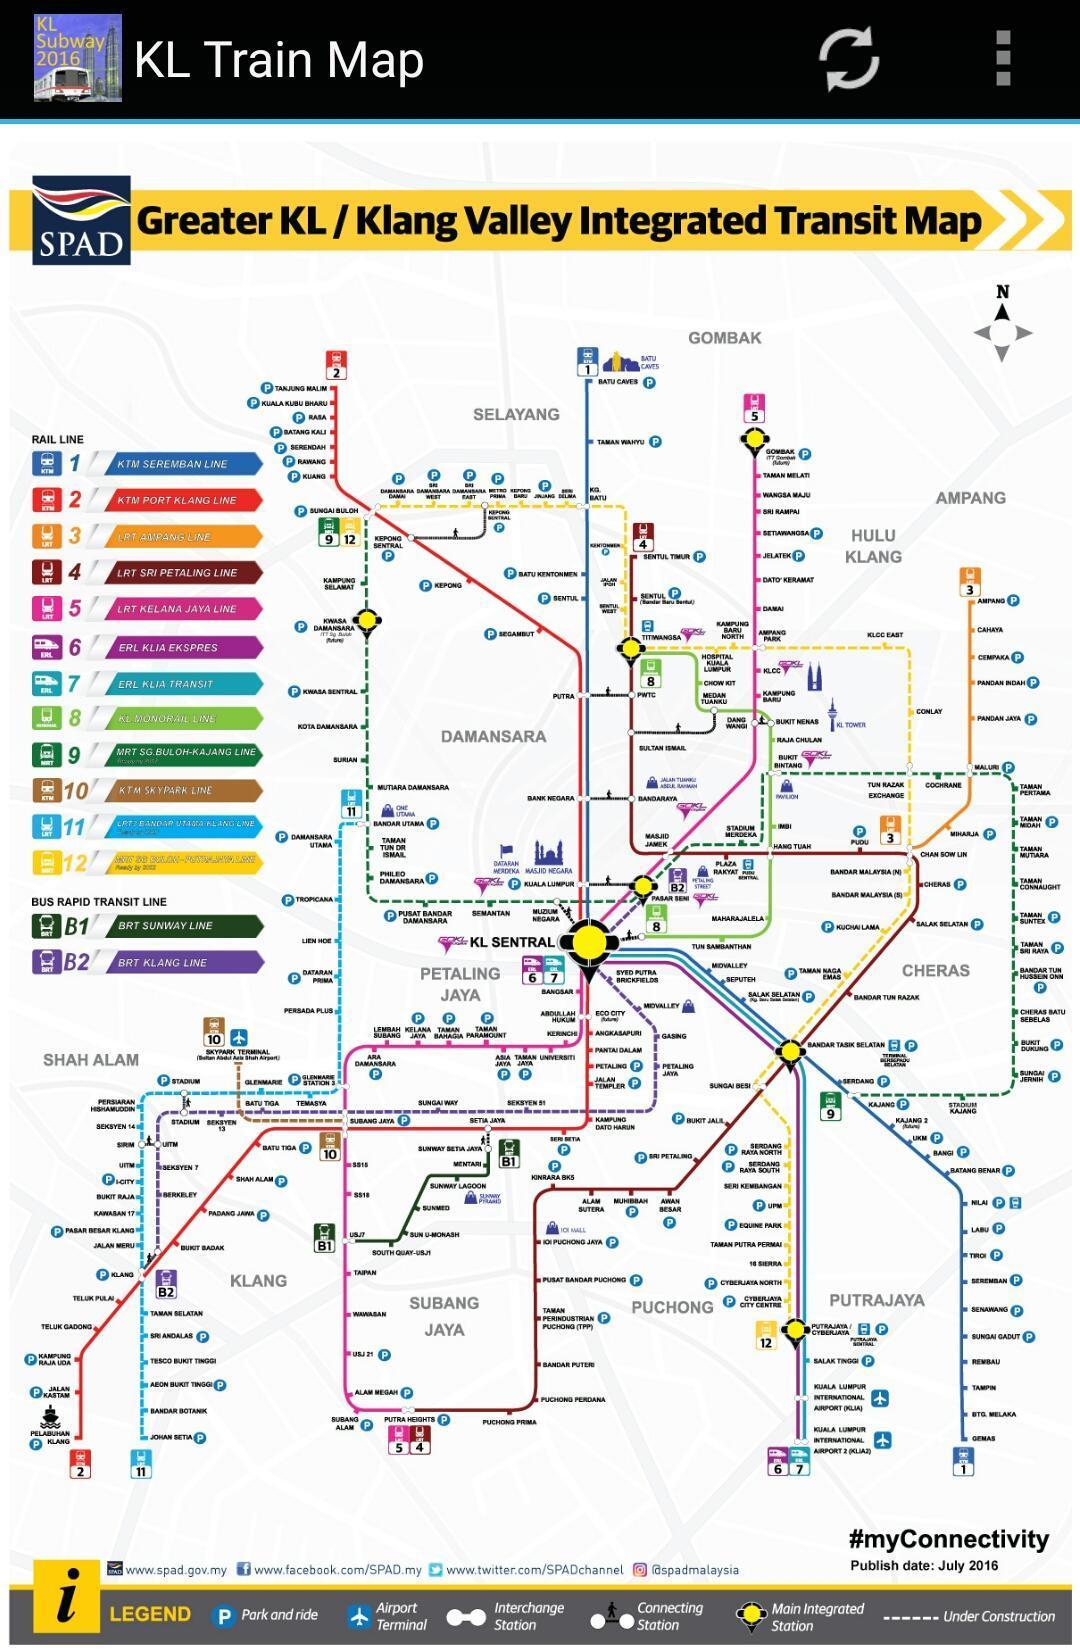 Kuala Lumpur Subway Map Pdf.Kuala Lumpur Kl Mrt Lrt Train Map 2019 For Android Apk Download